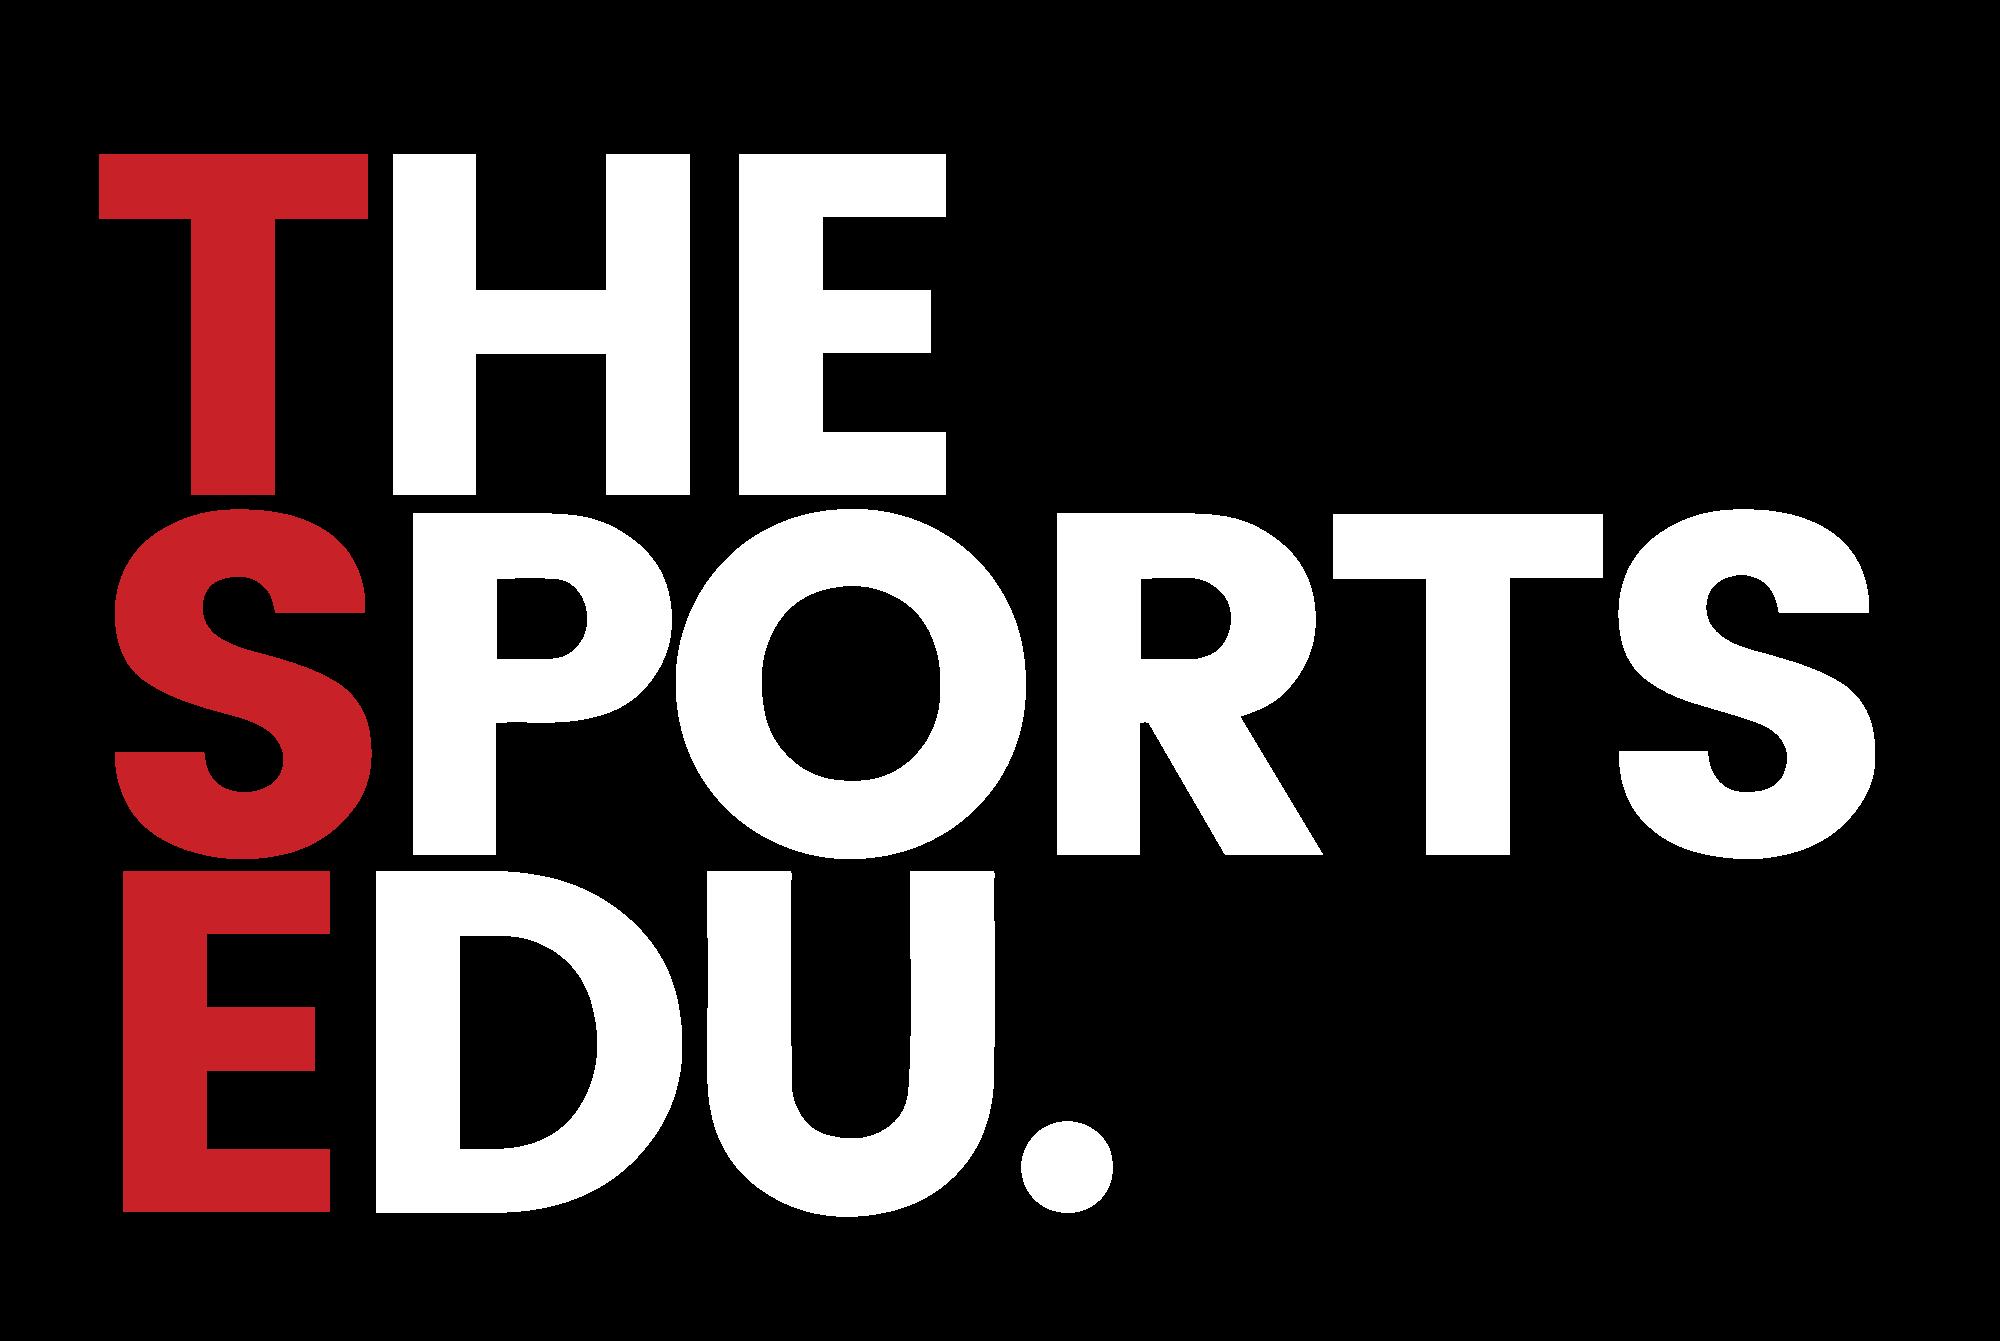 The Sports Edu